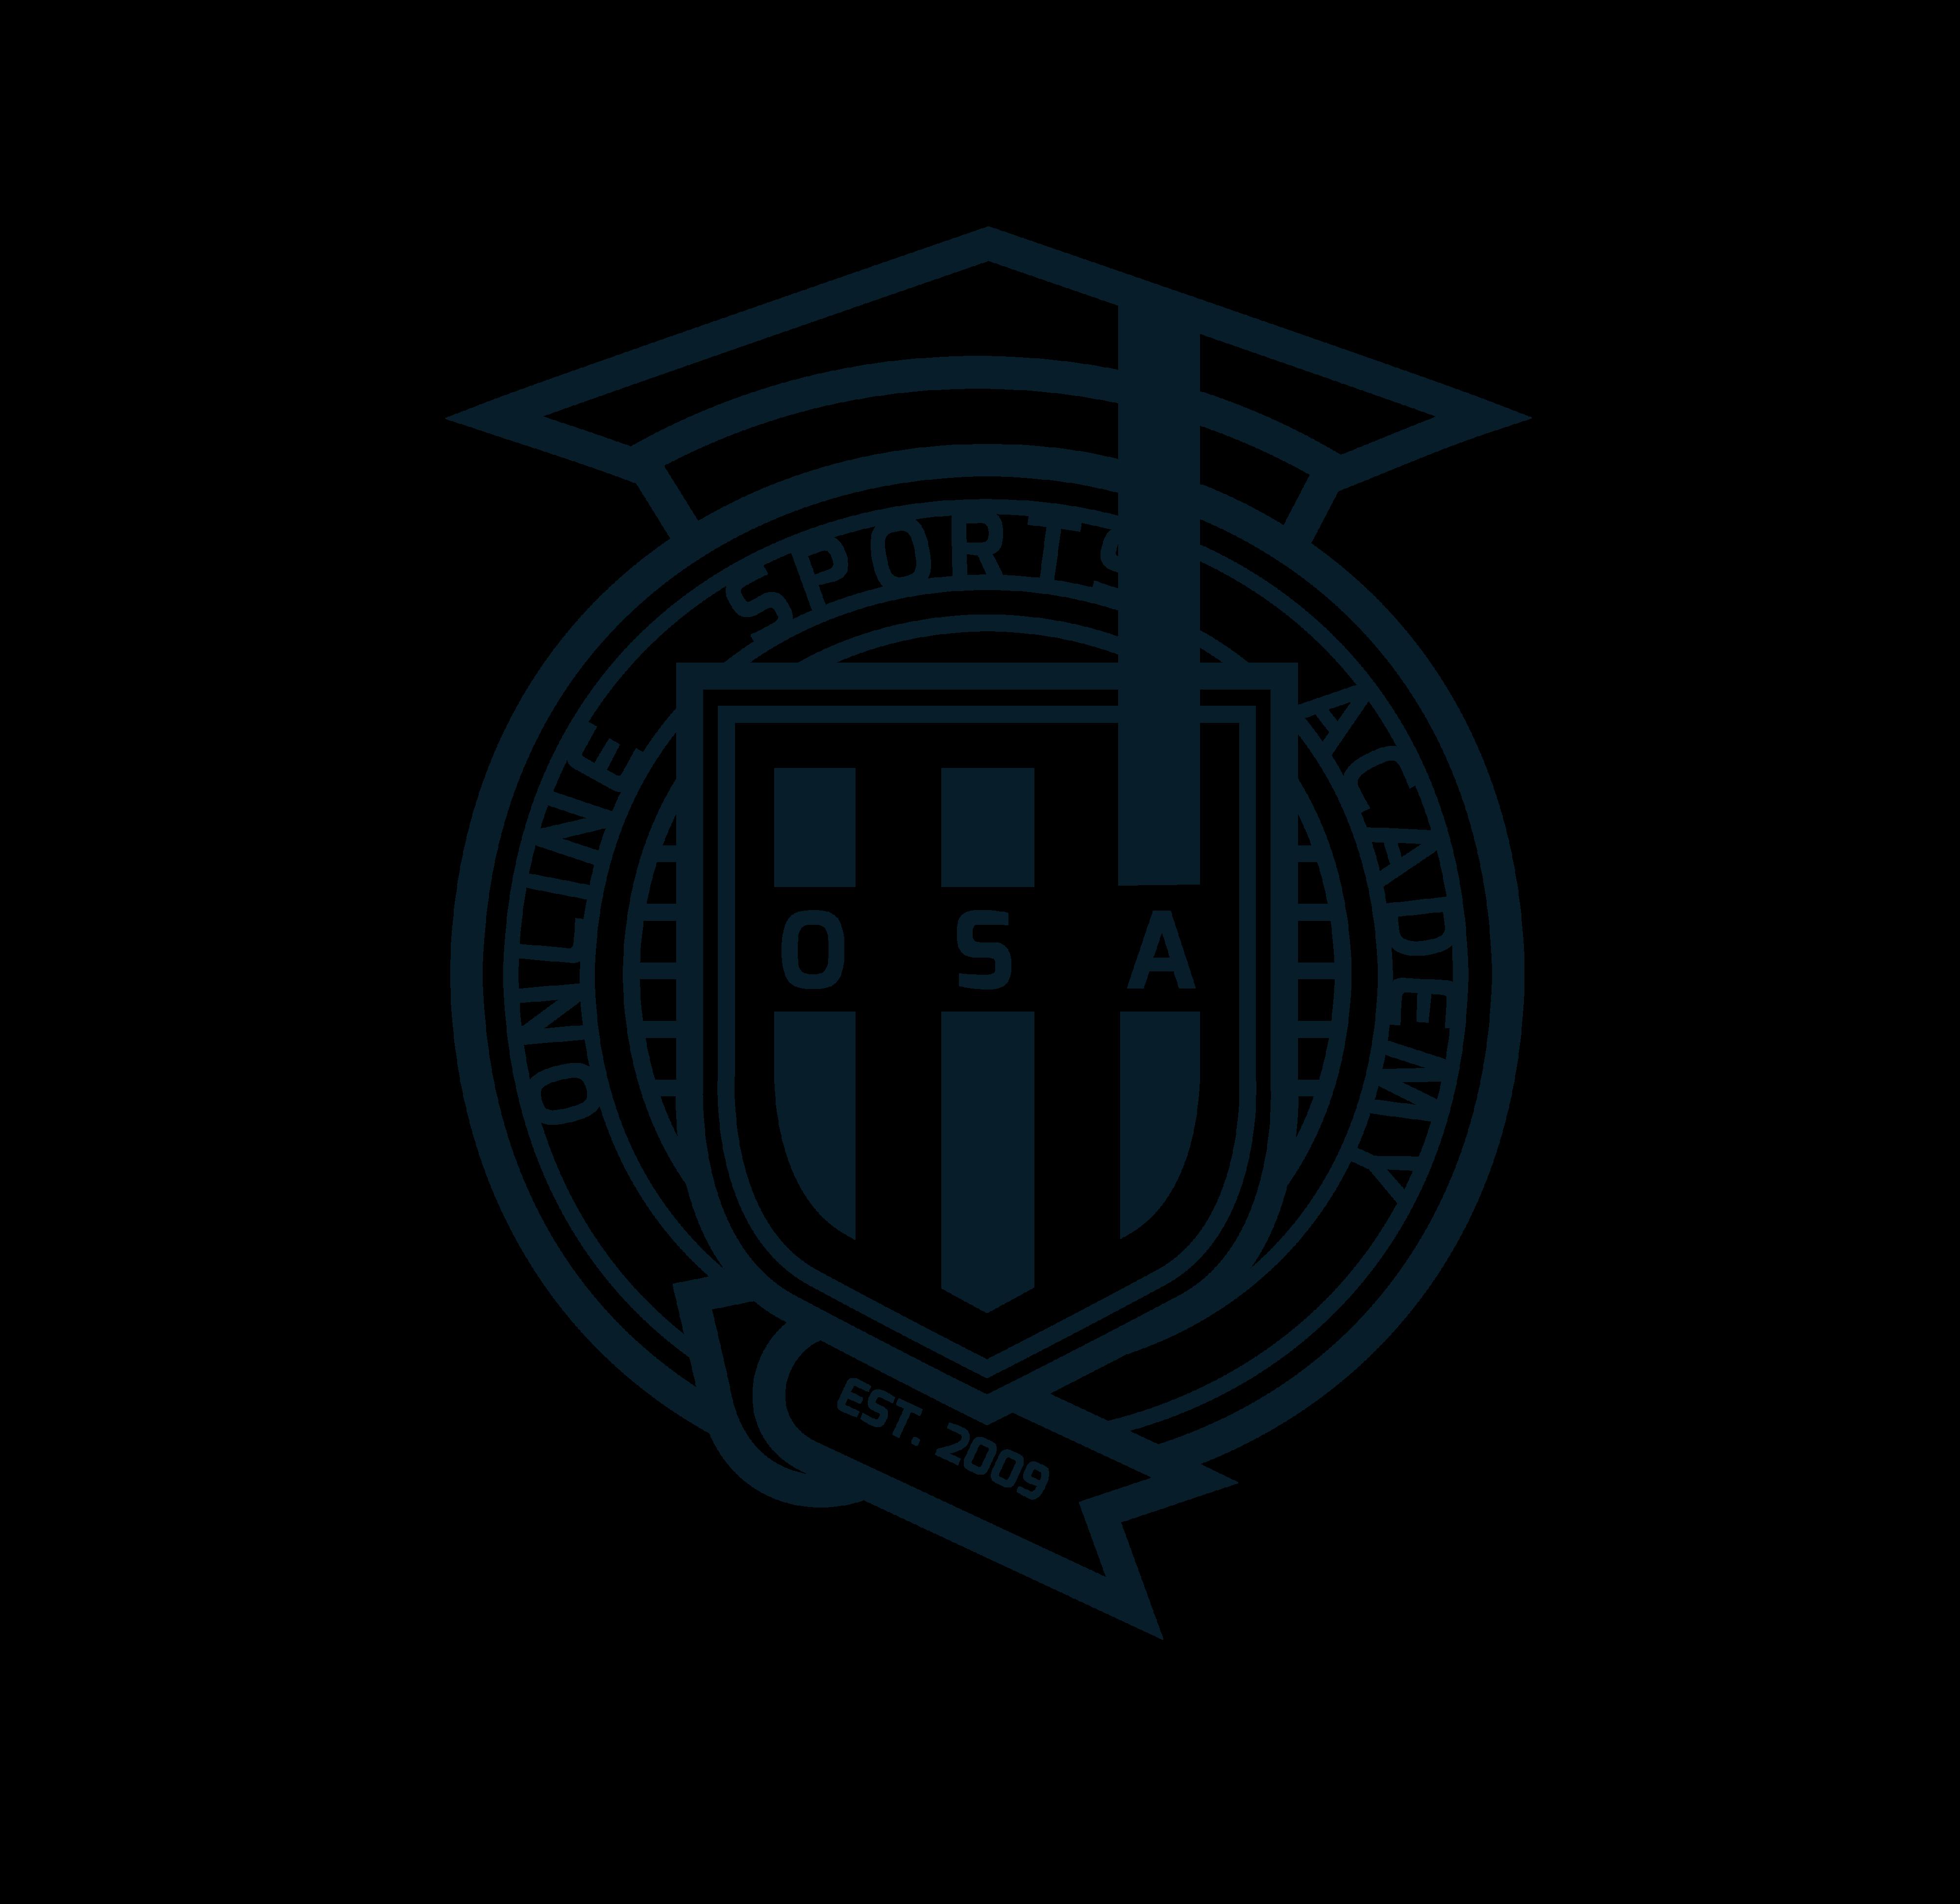 Online sports academy